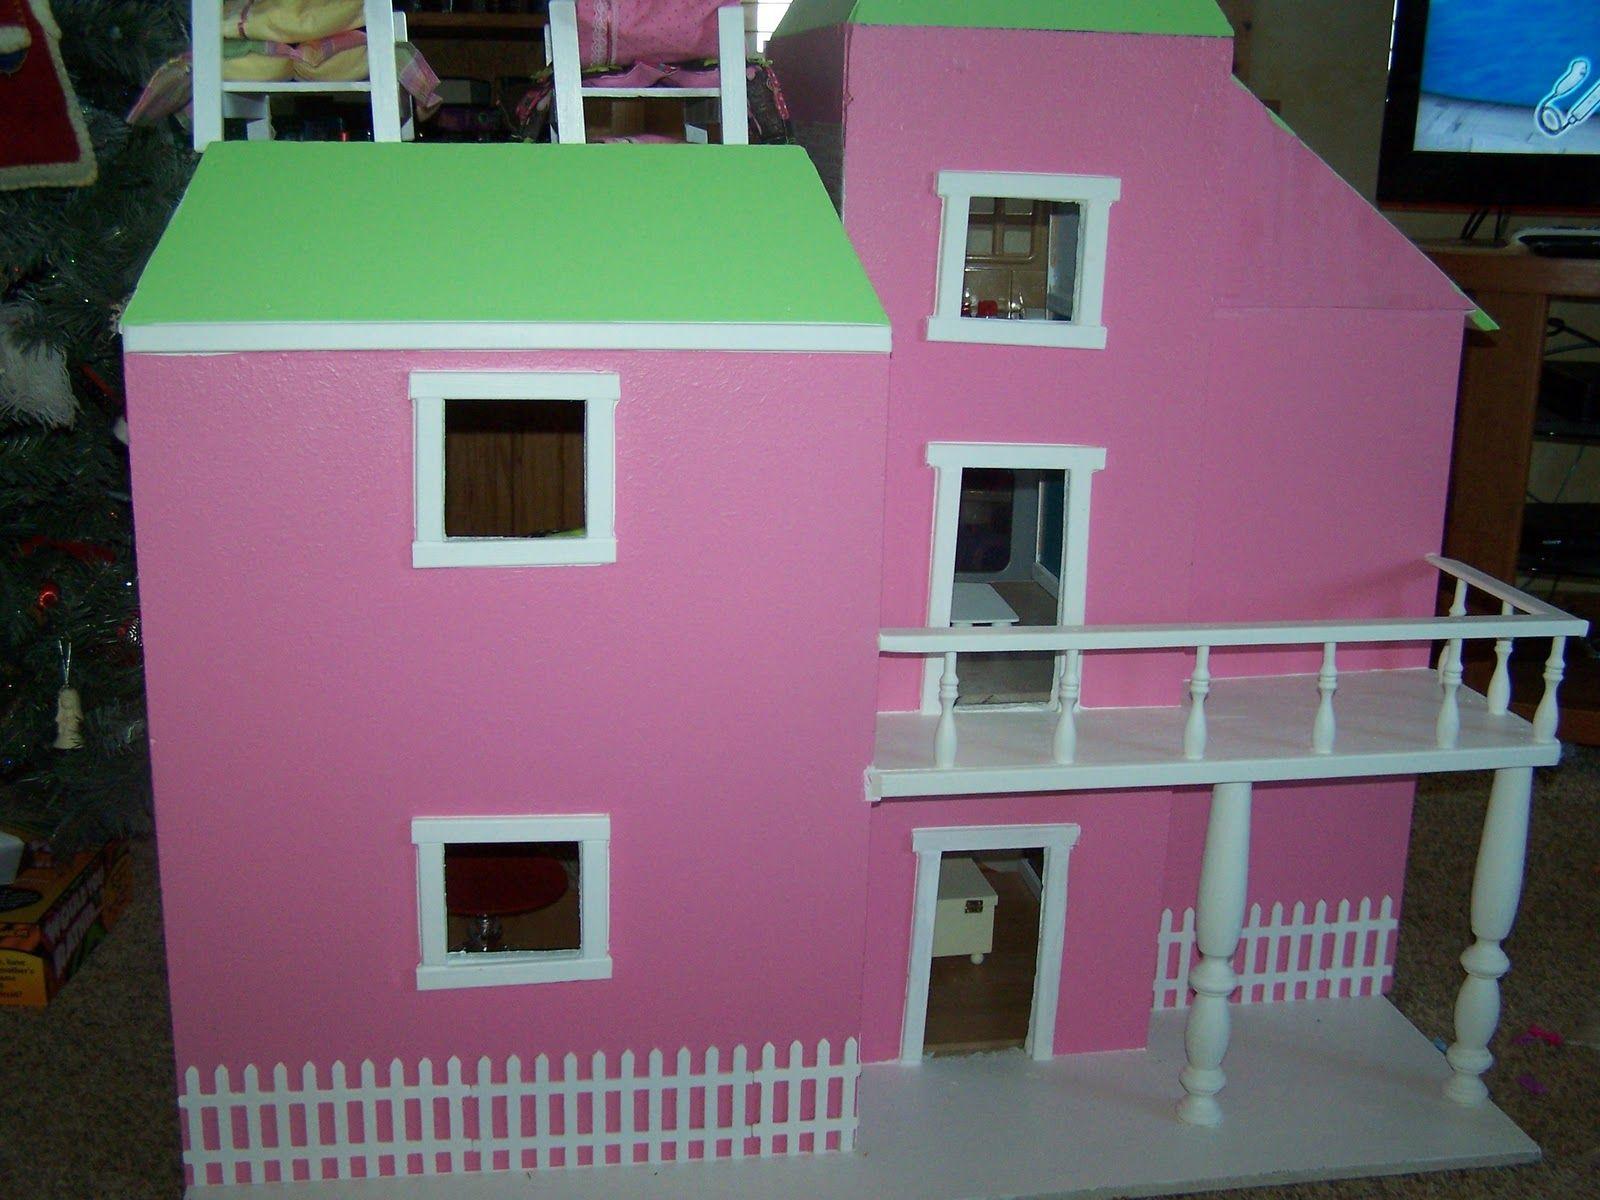 10 Awesome Barbie Doll House Models - Mommy s menu homemade barbie house